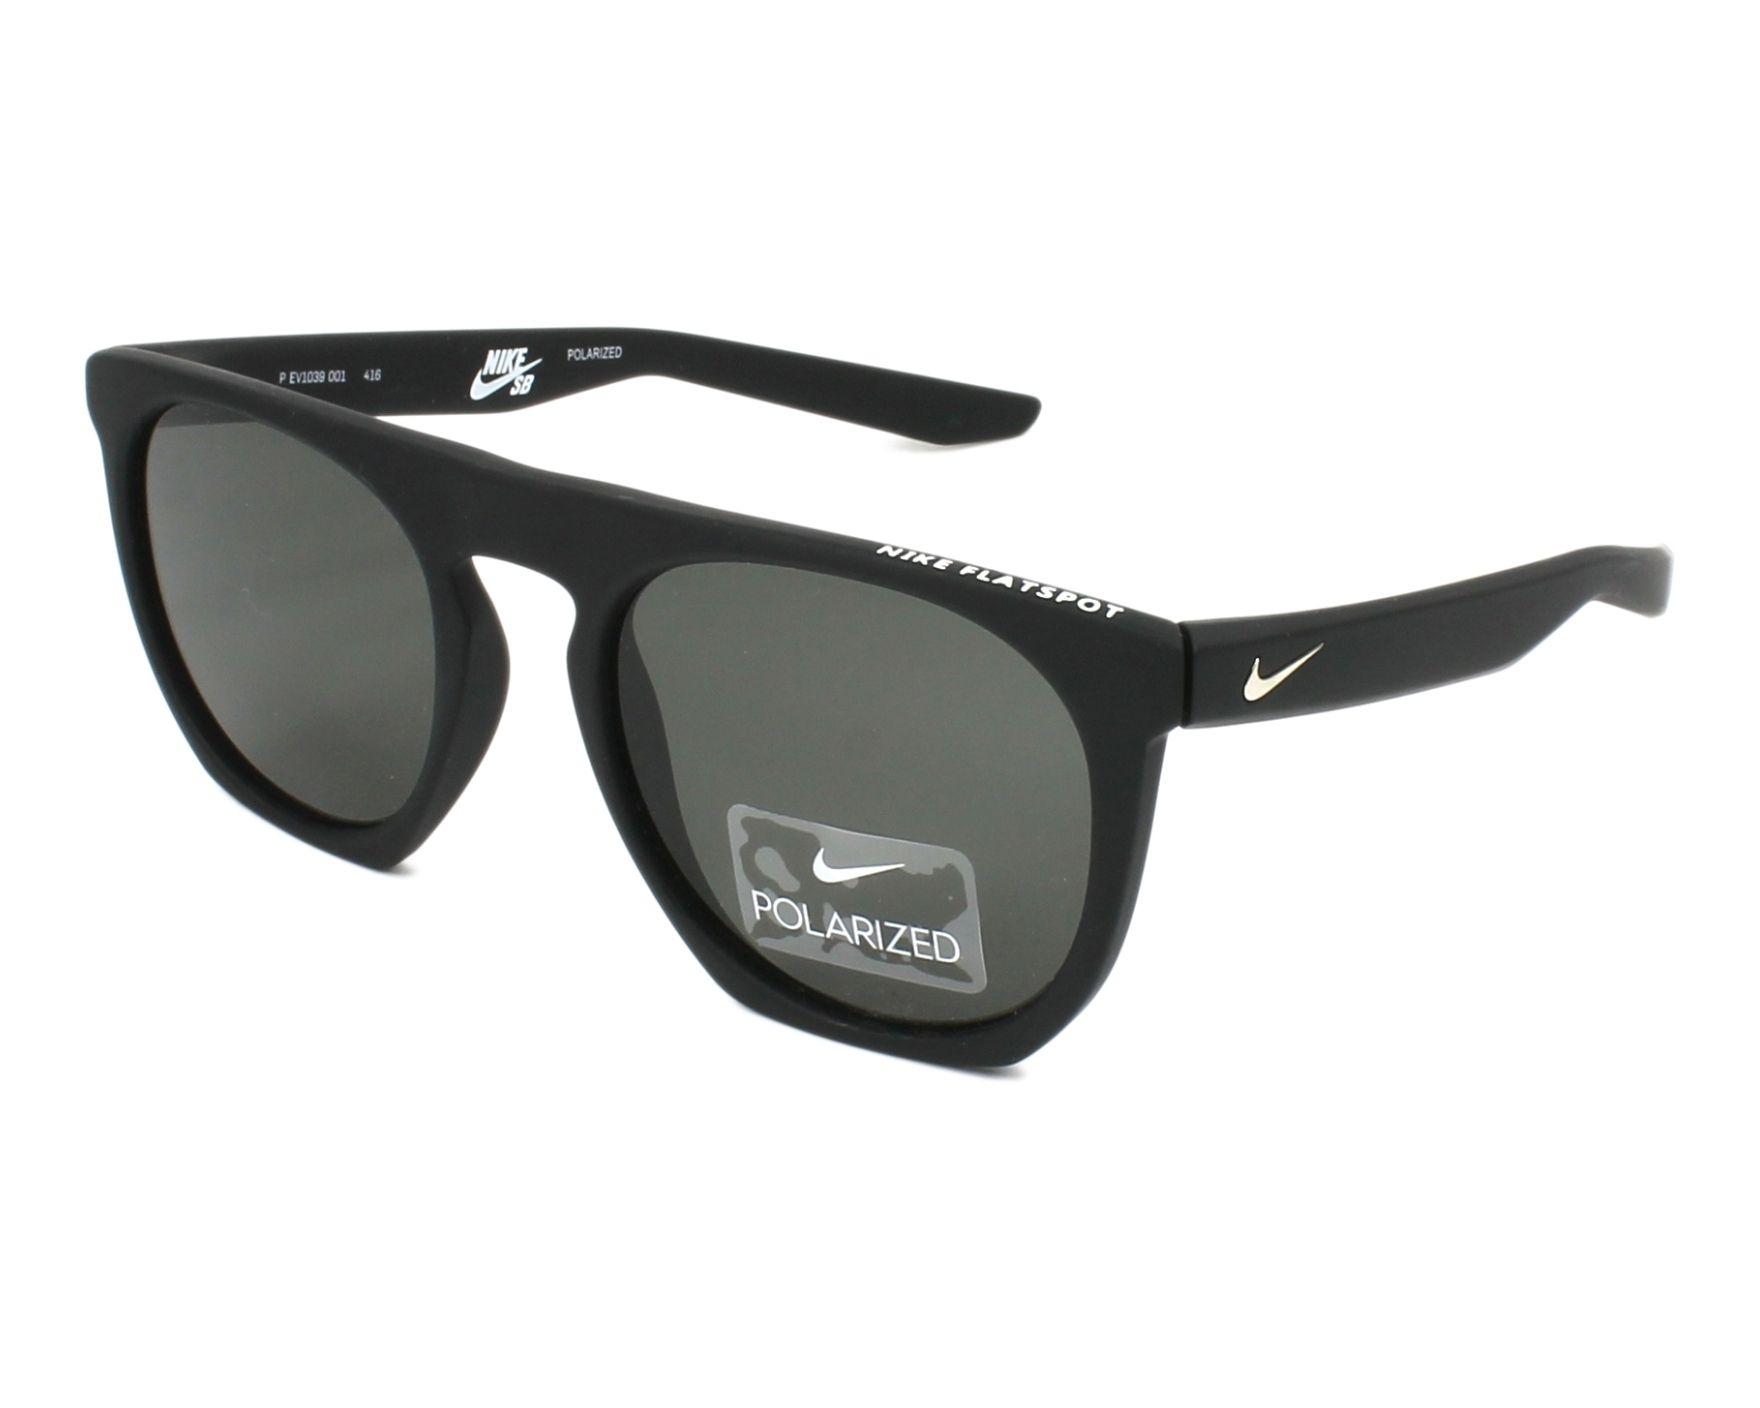 Sunglasses Nike EV-1039 001 52-20 Black profile view 56852dd86fc1